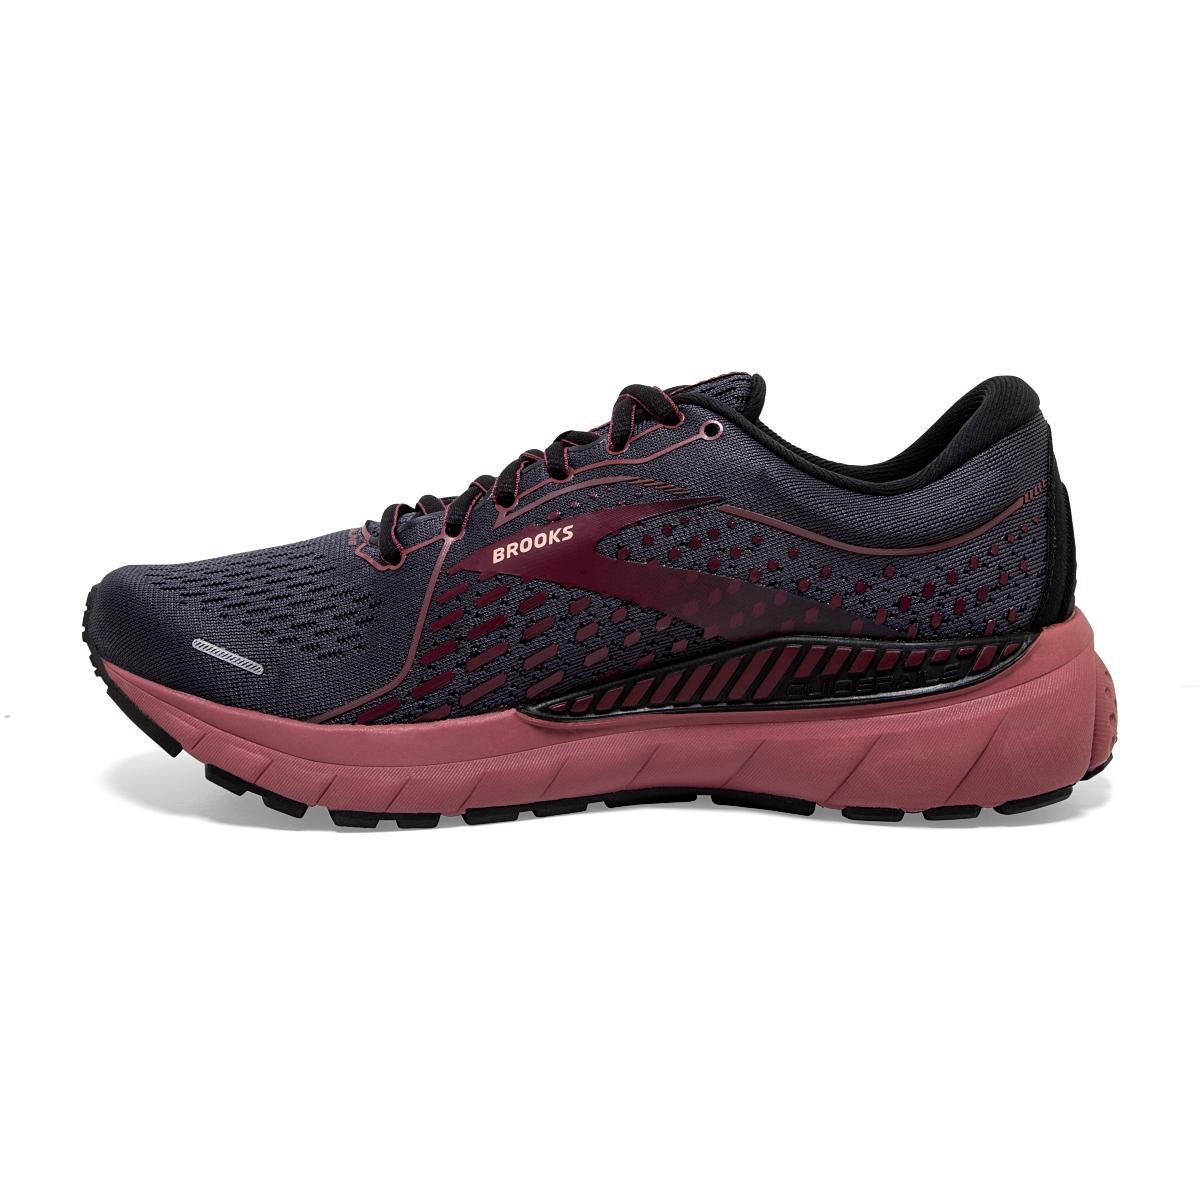 Women's Brooks Adrenaline GTS 21 Running Shoe, , large, image 2